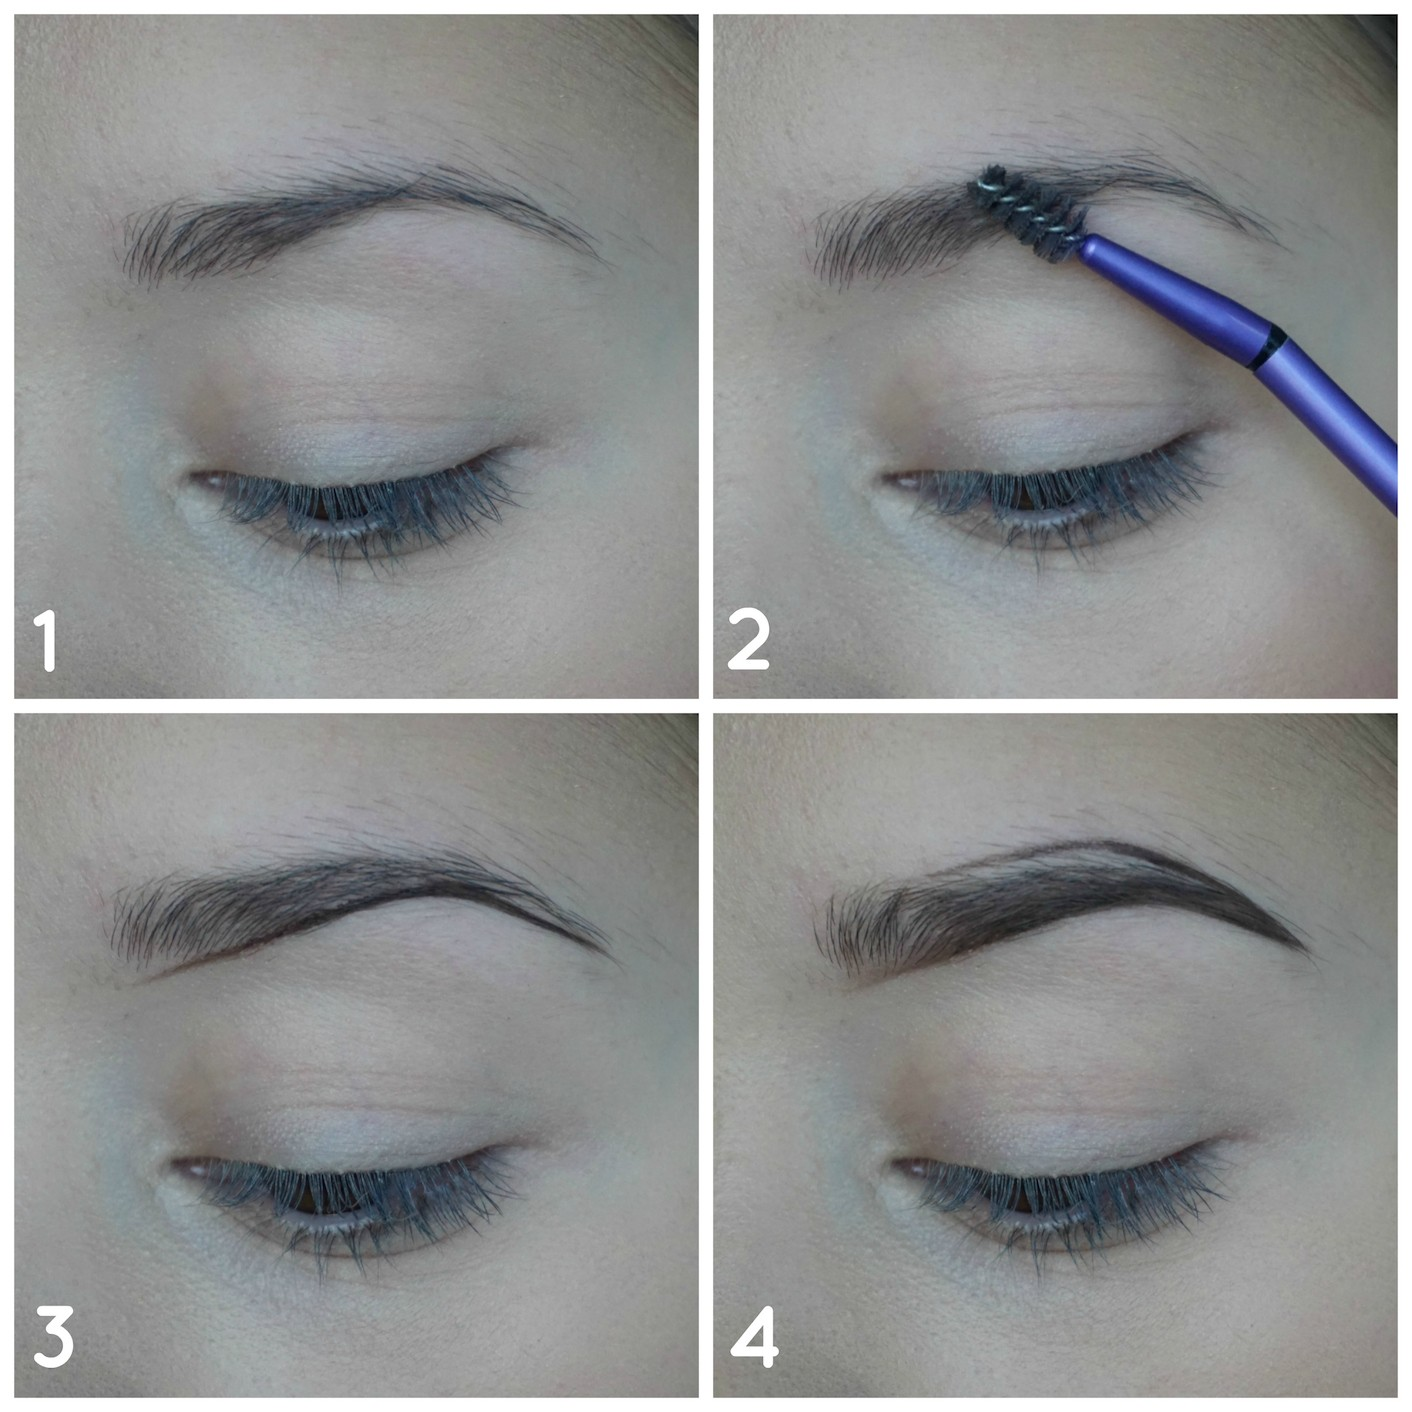 hvordan får man flotte øjenbryn